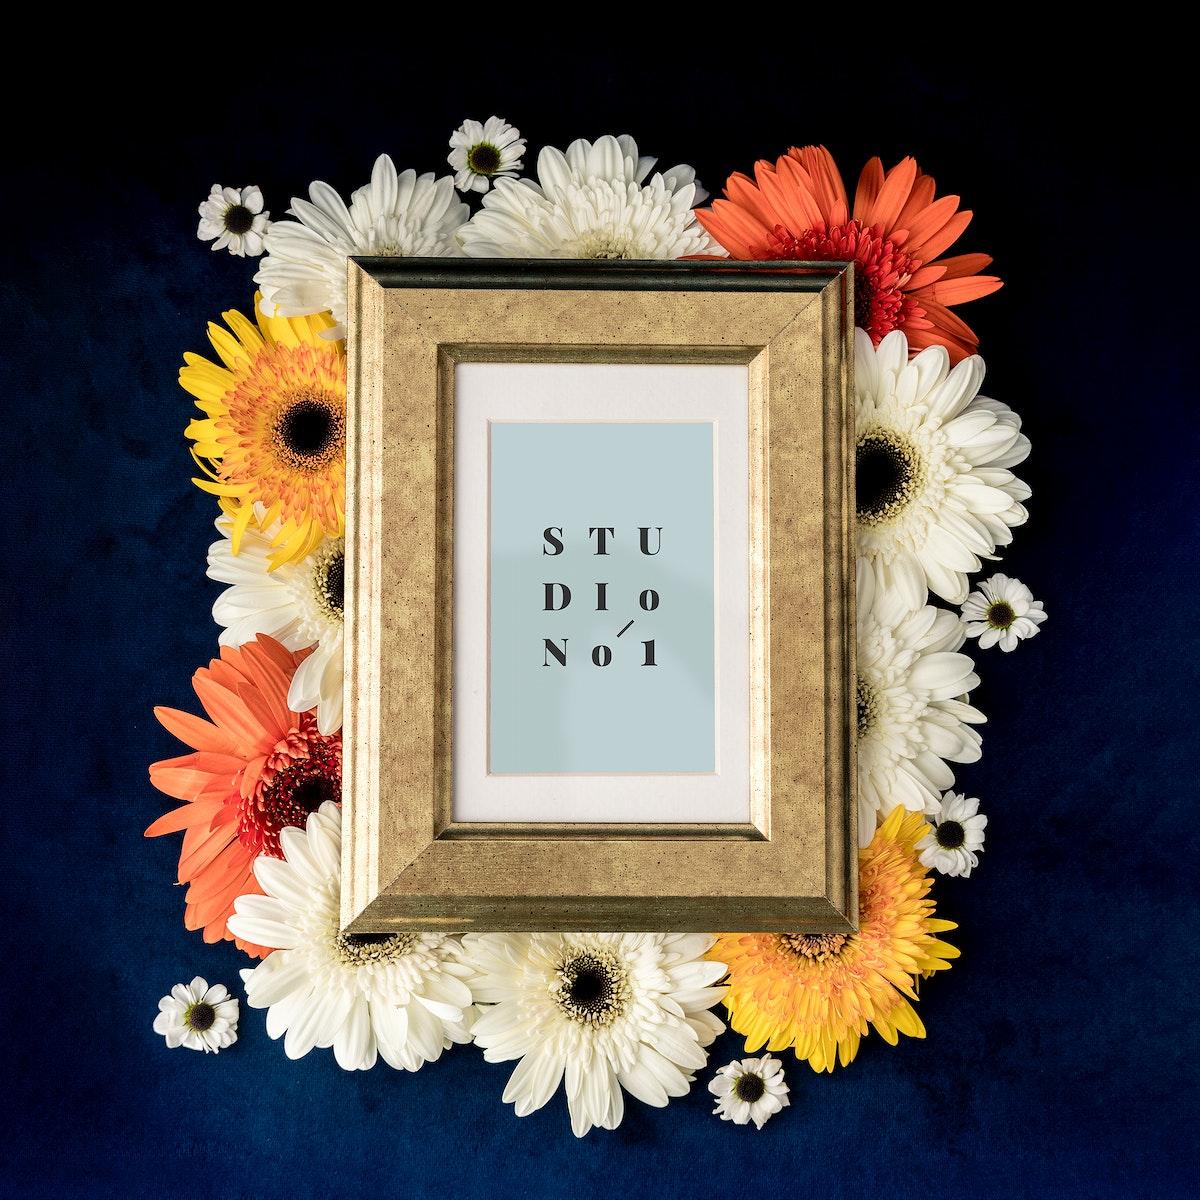 Flowers surrounding a photo frame mockup